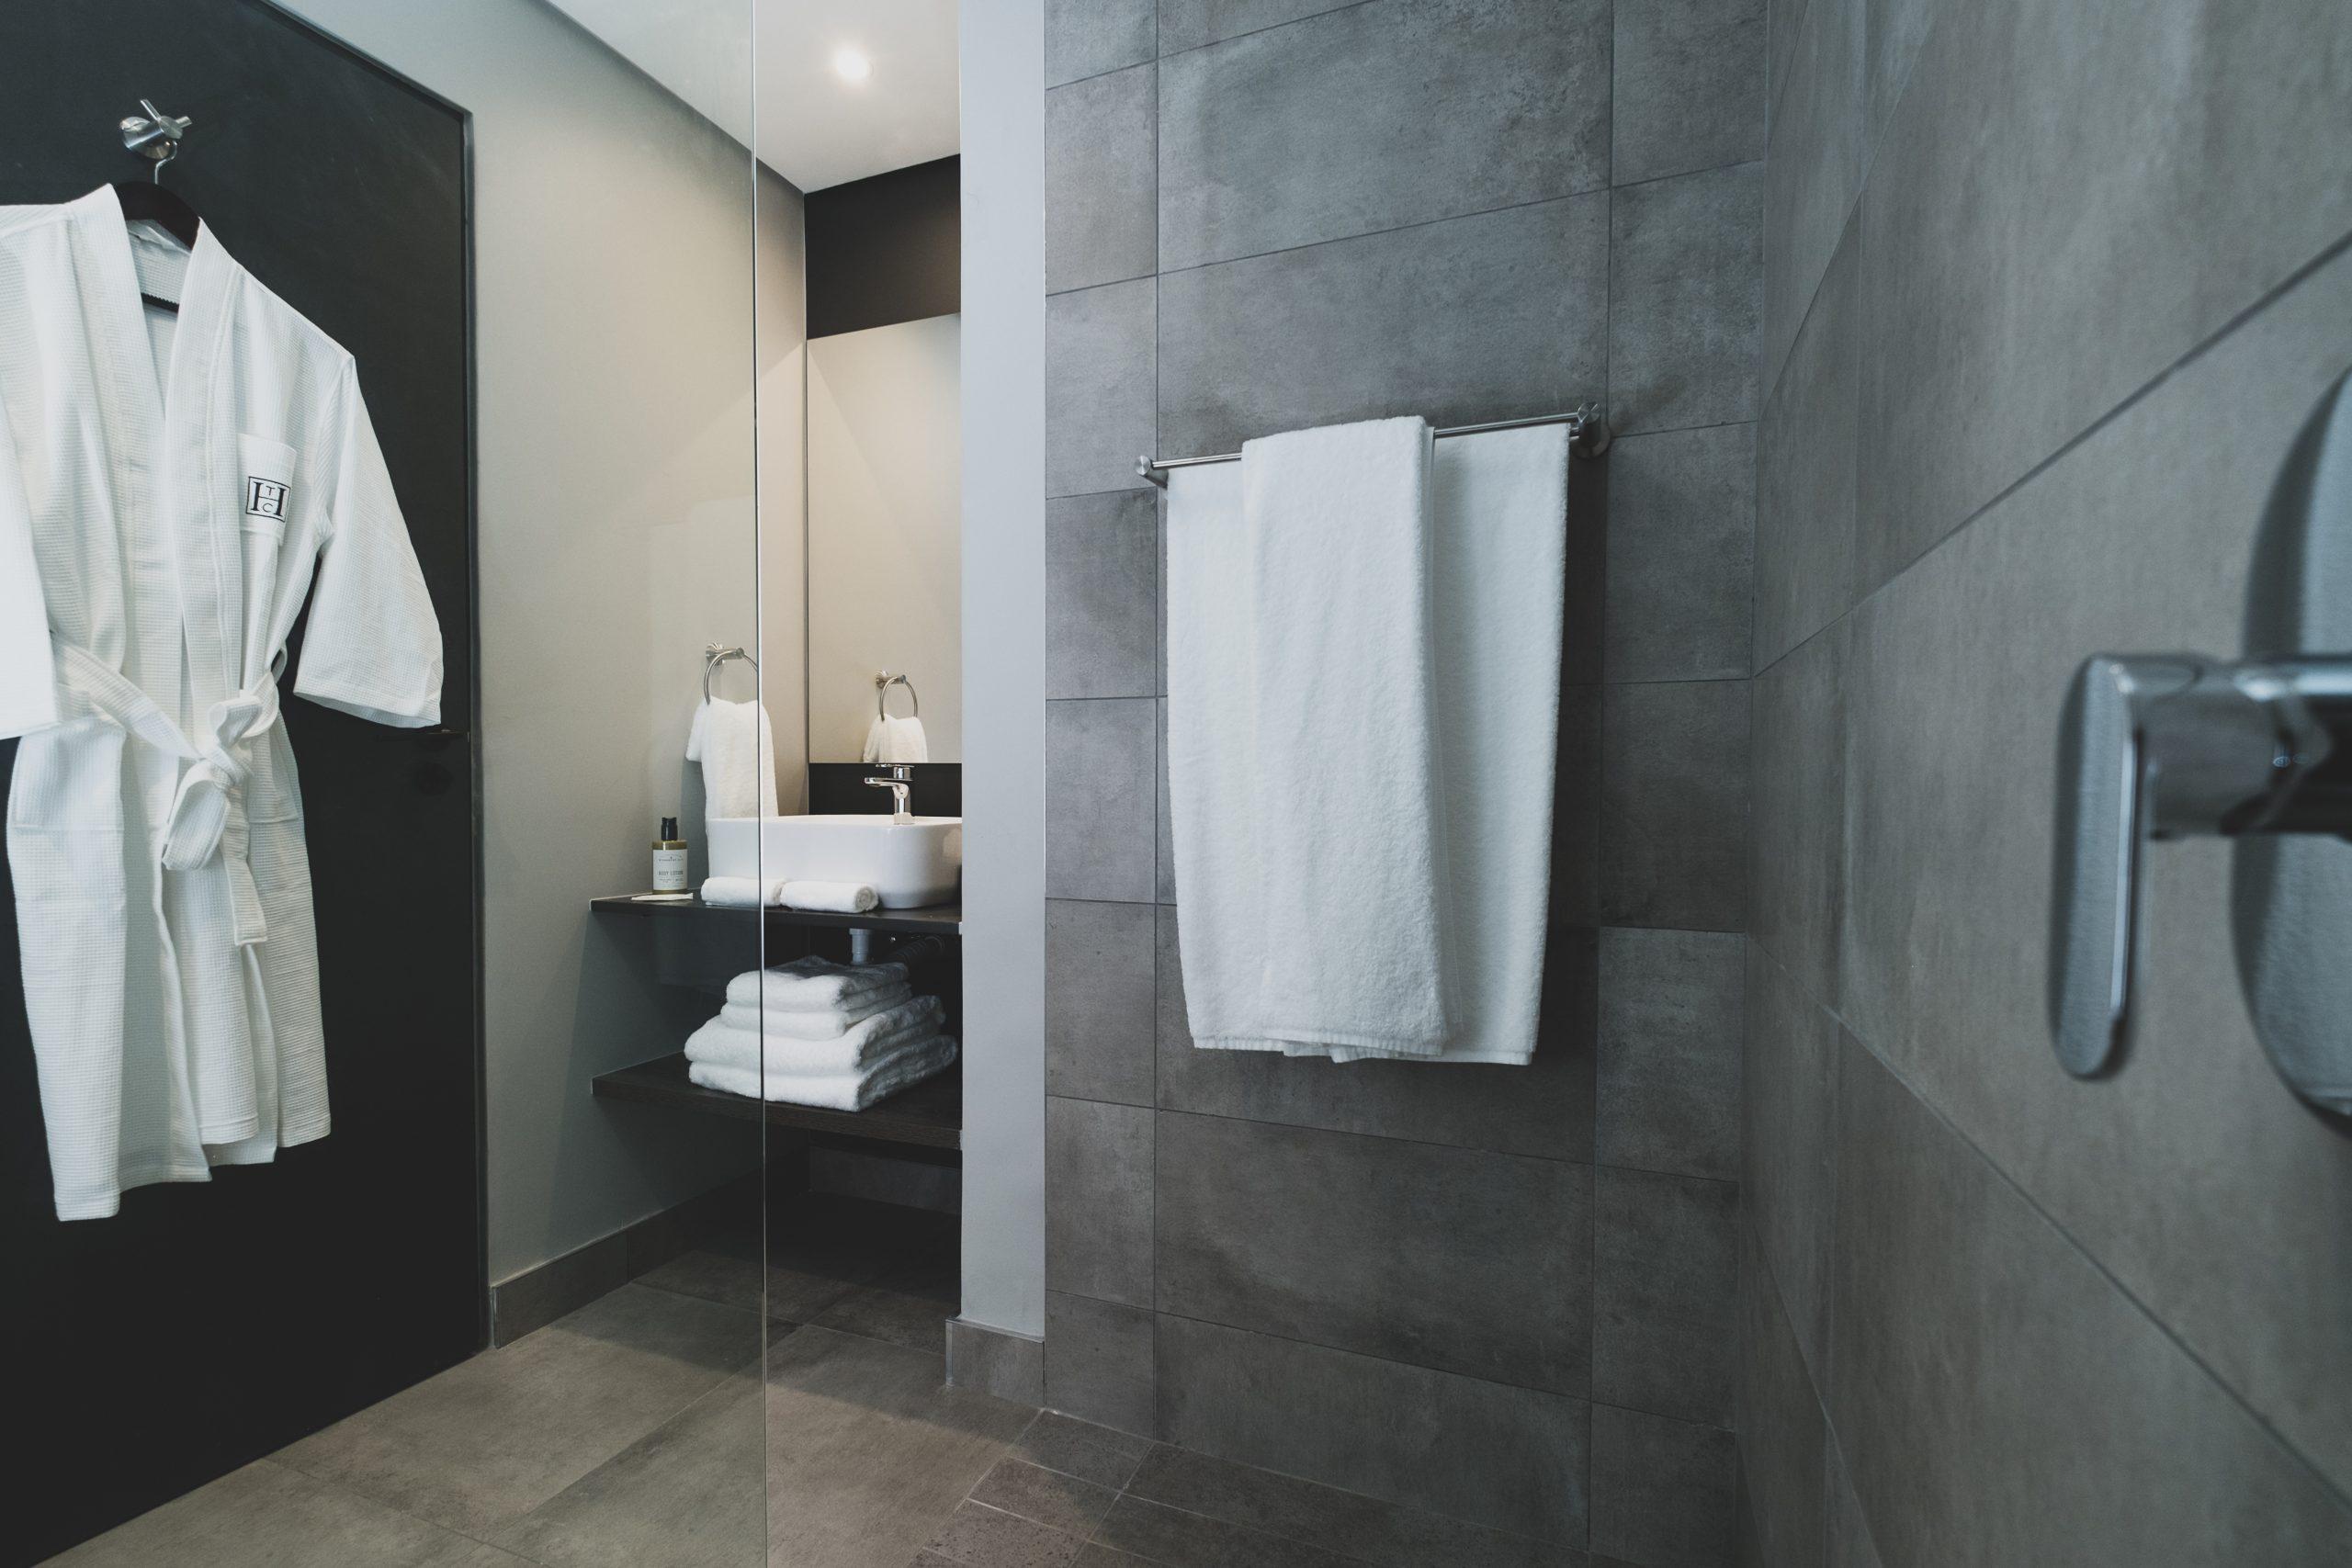 The Catalyst hotel bathroom